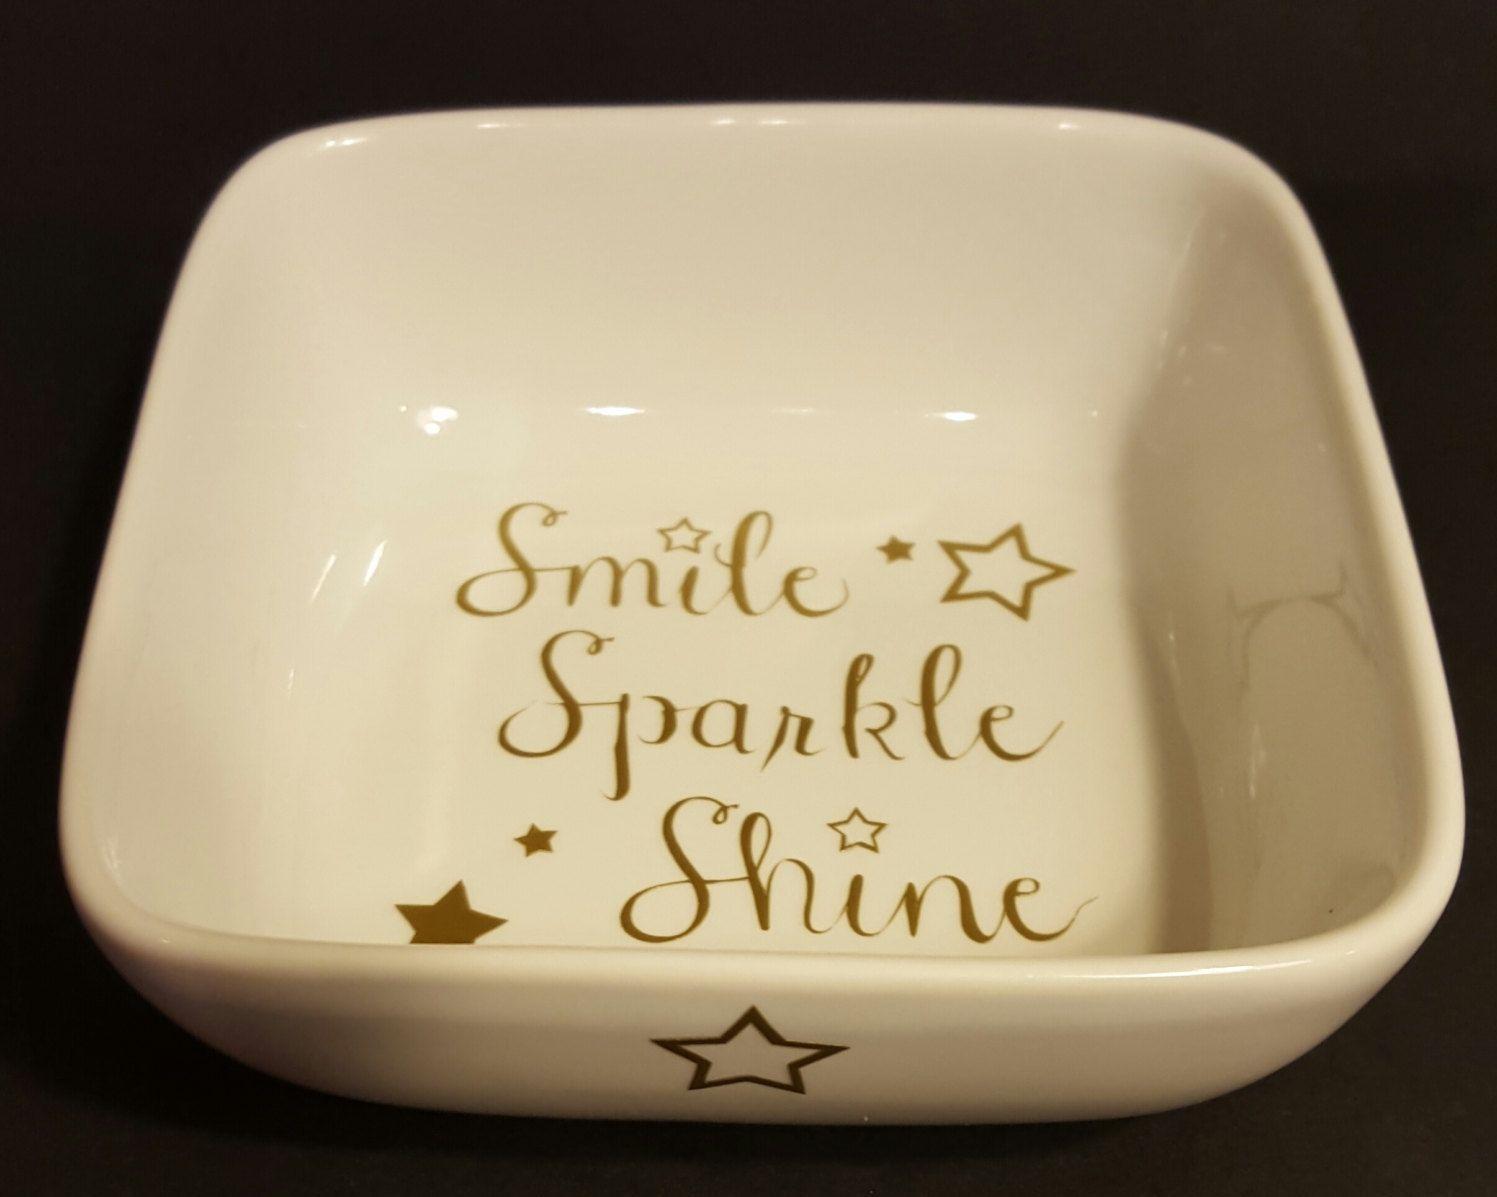 Smile Sparkle Shine porcelain ring dish    white porcelain with